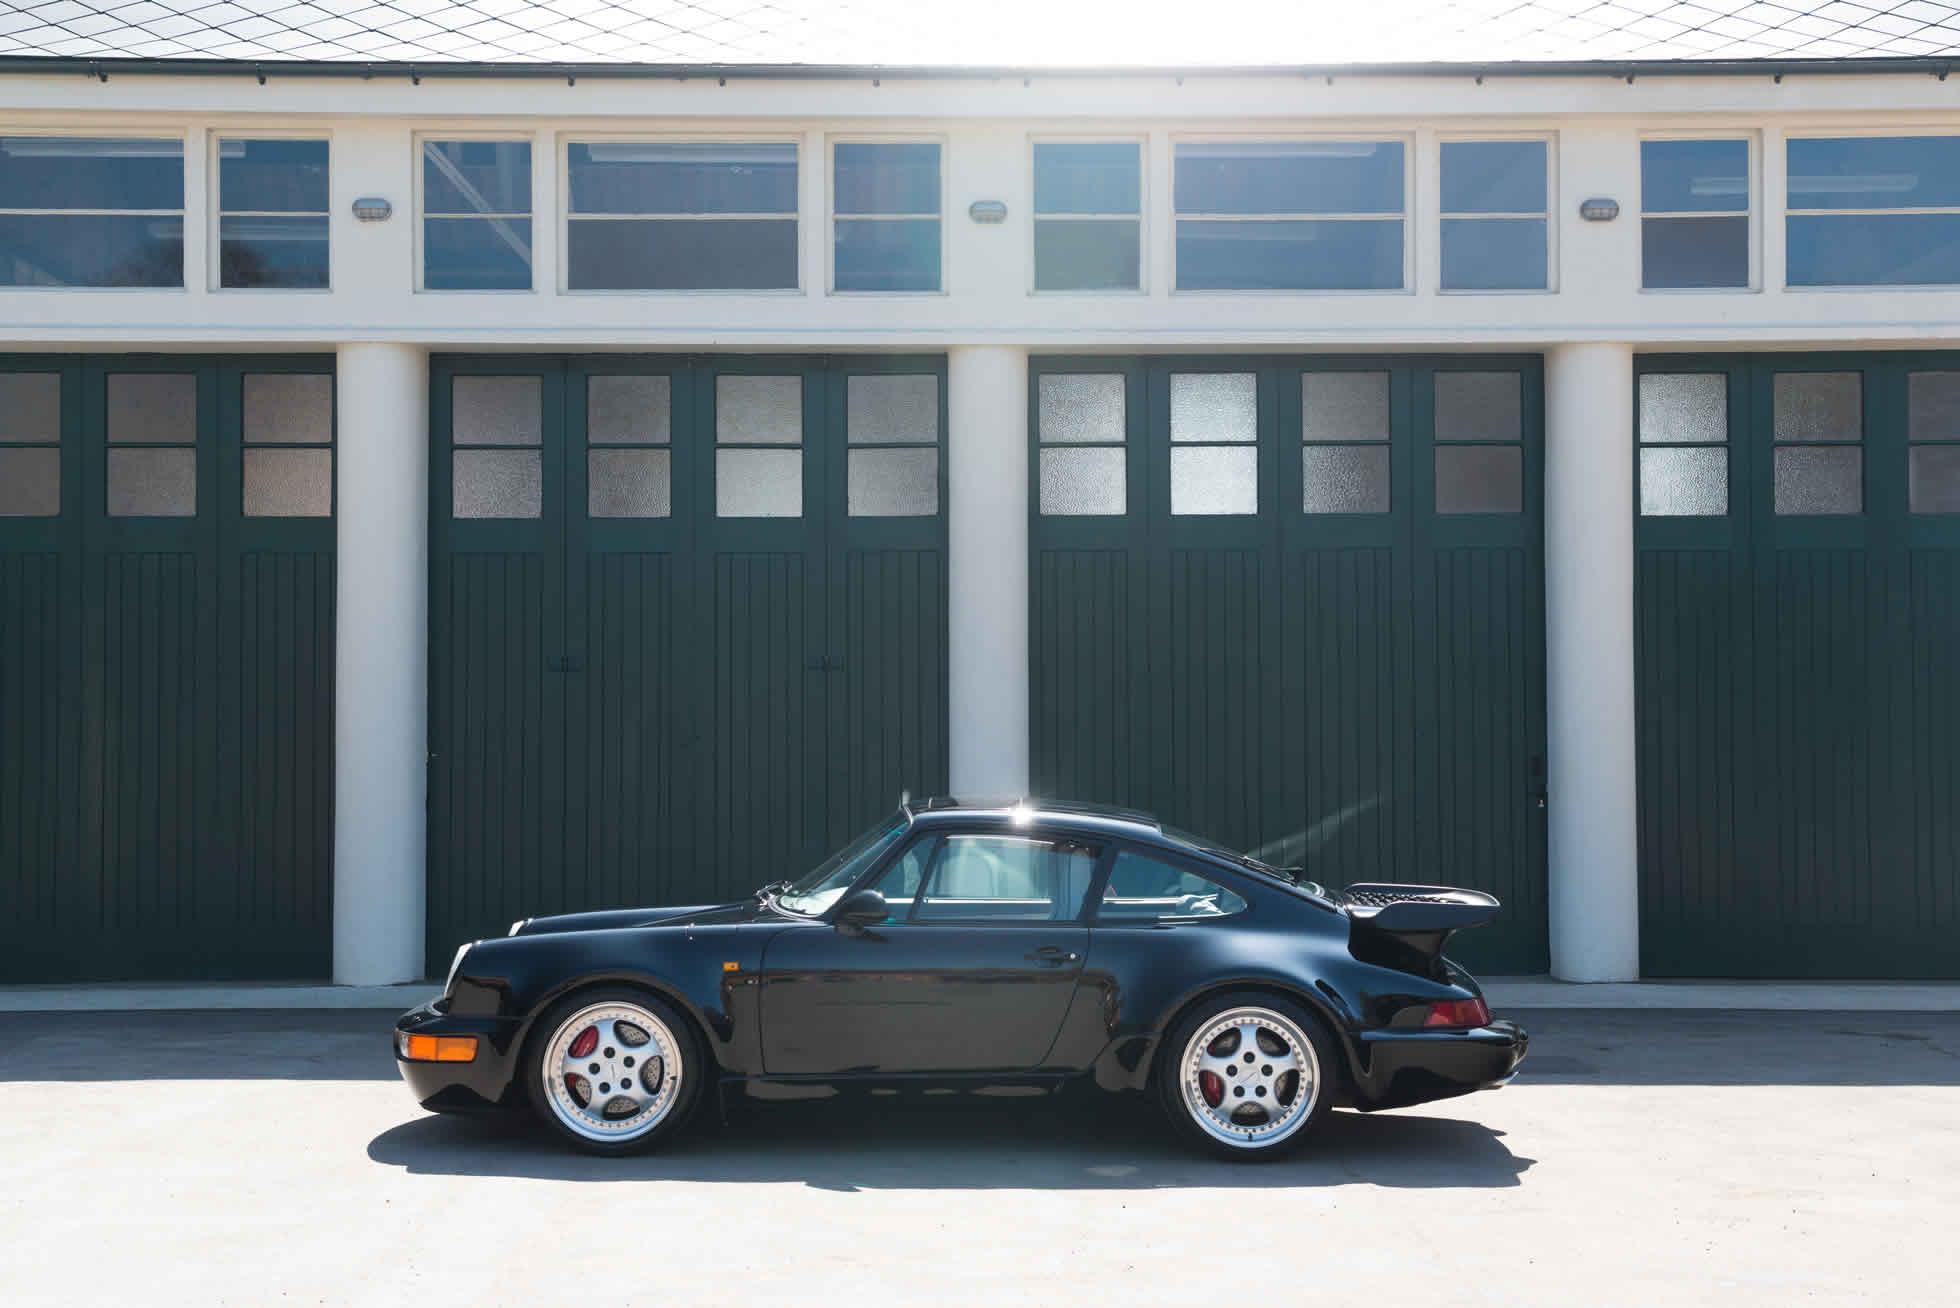 For Sale 1993 Porsche 911 964 Turbo 3.6 side view